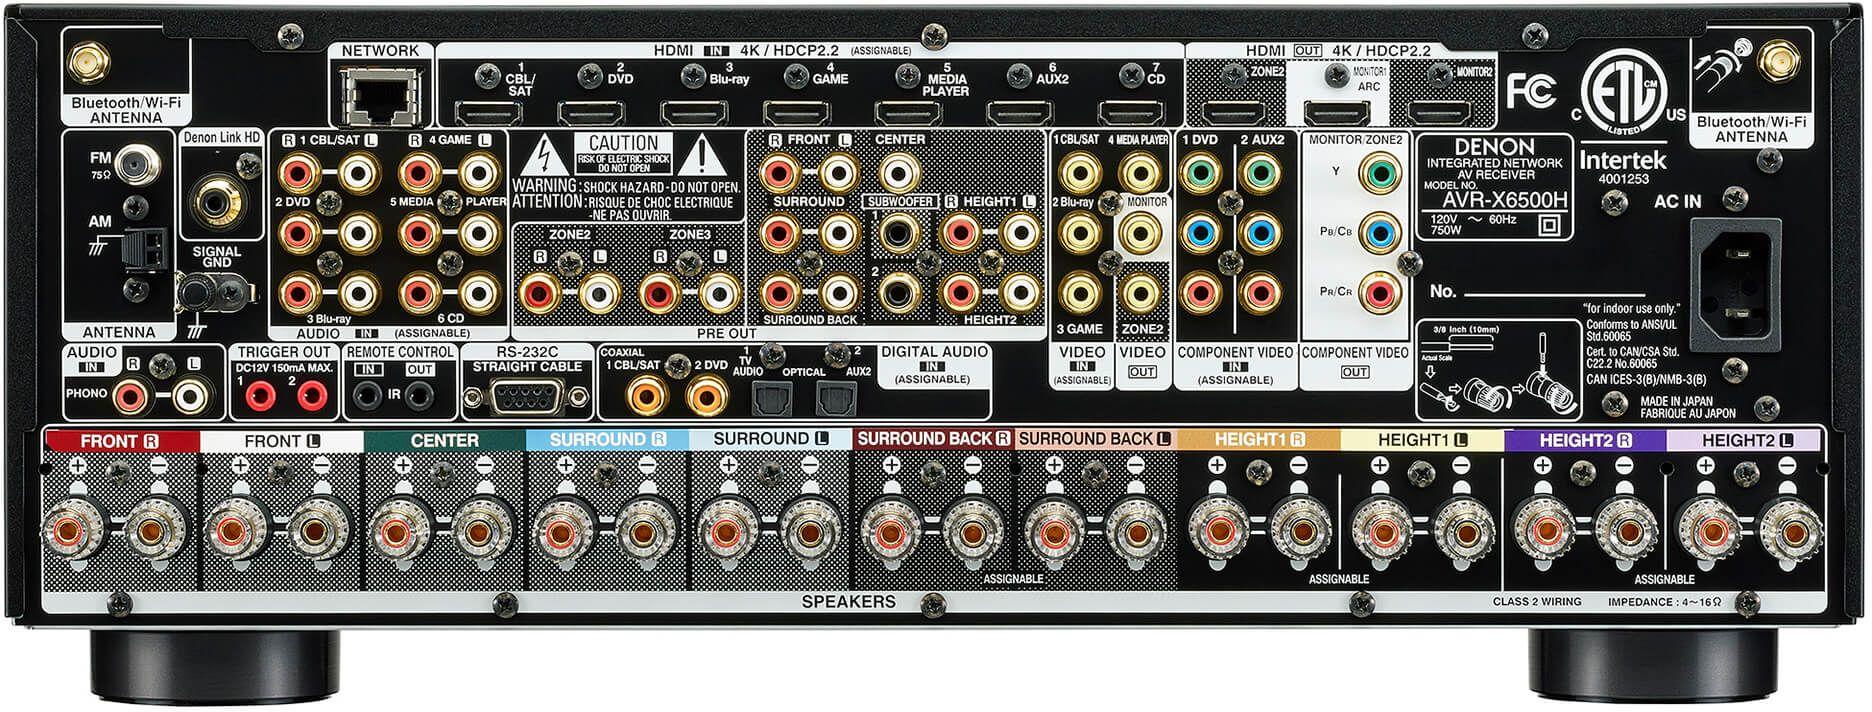 Denon® 11 2 Channel 4K A/V Receiver-AVR-X6500H | Good Vibes Sound